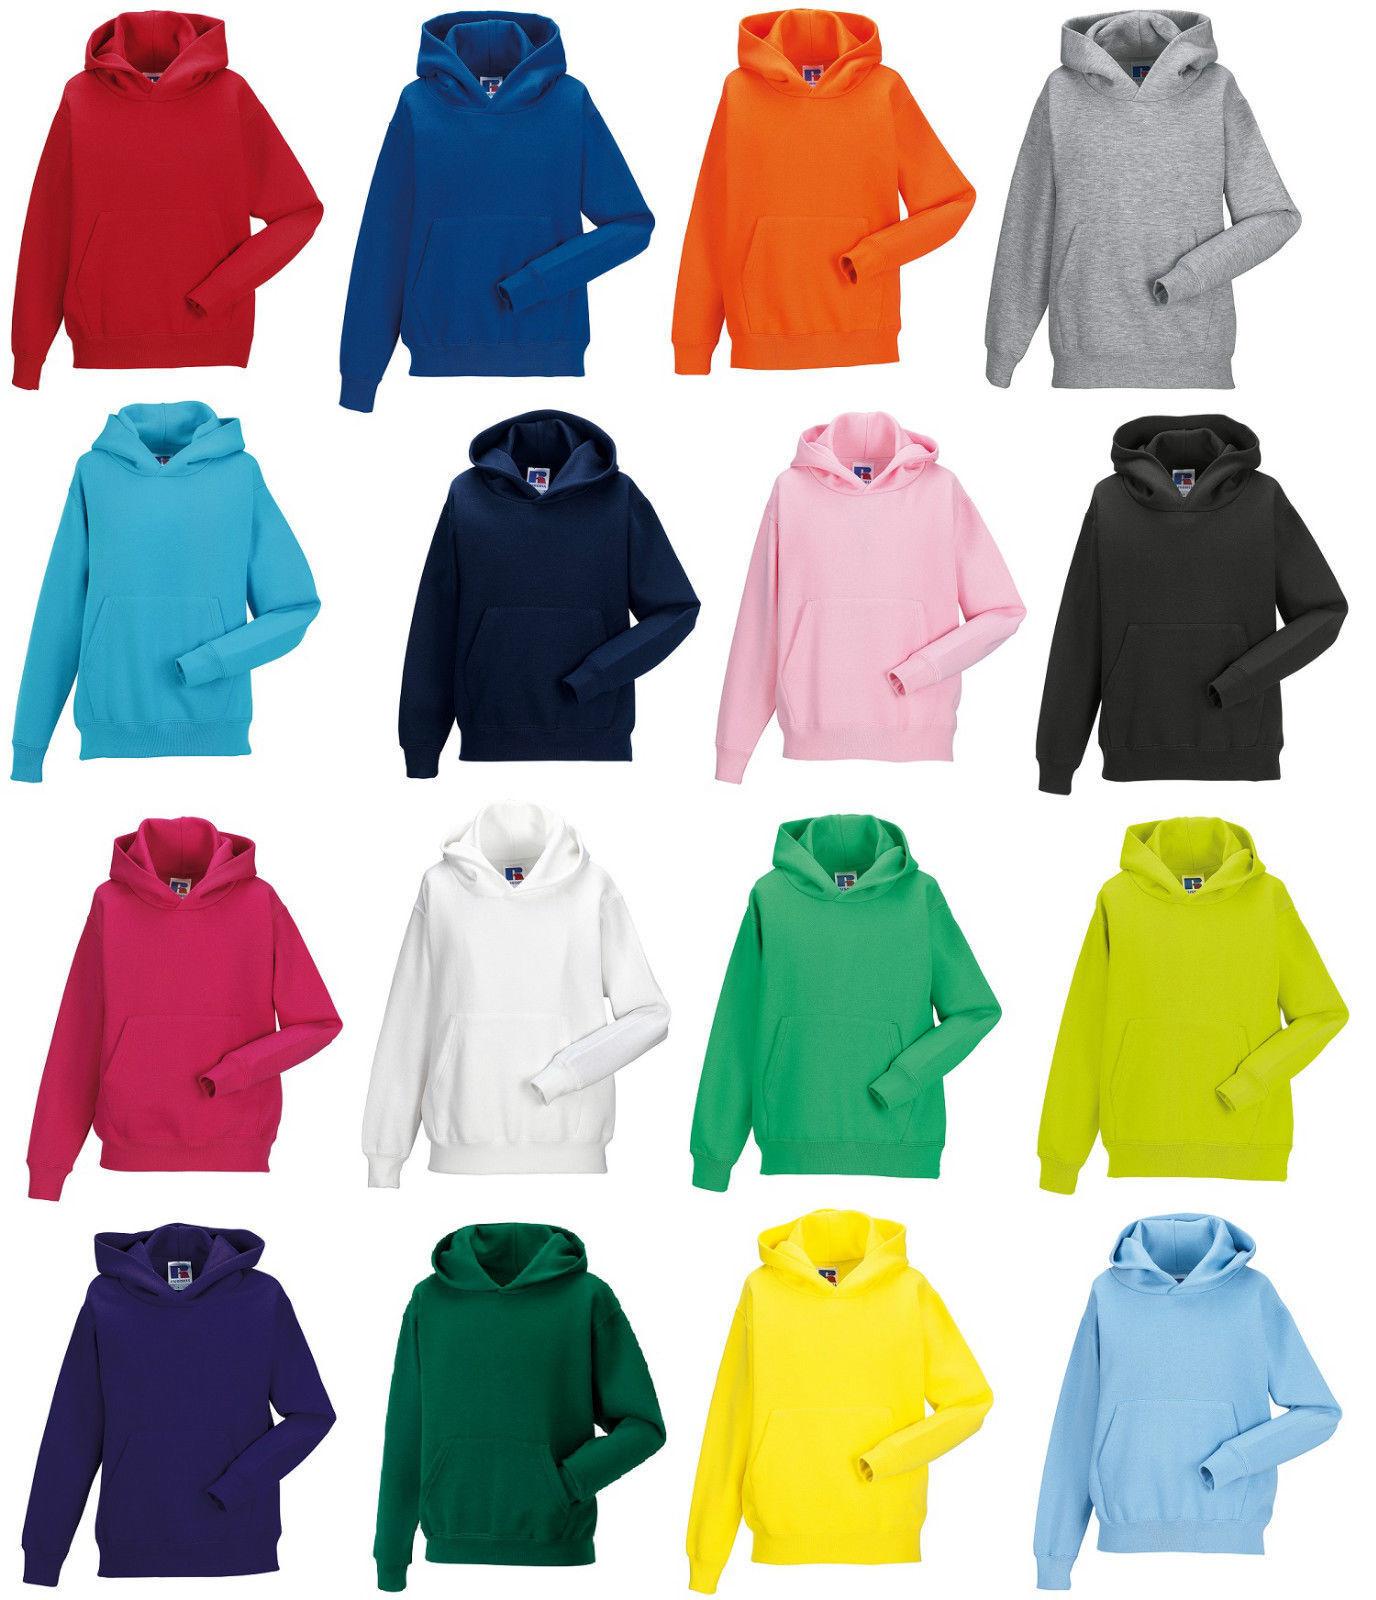 Russell School Girls Sweatshirt Cardigan